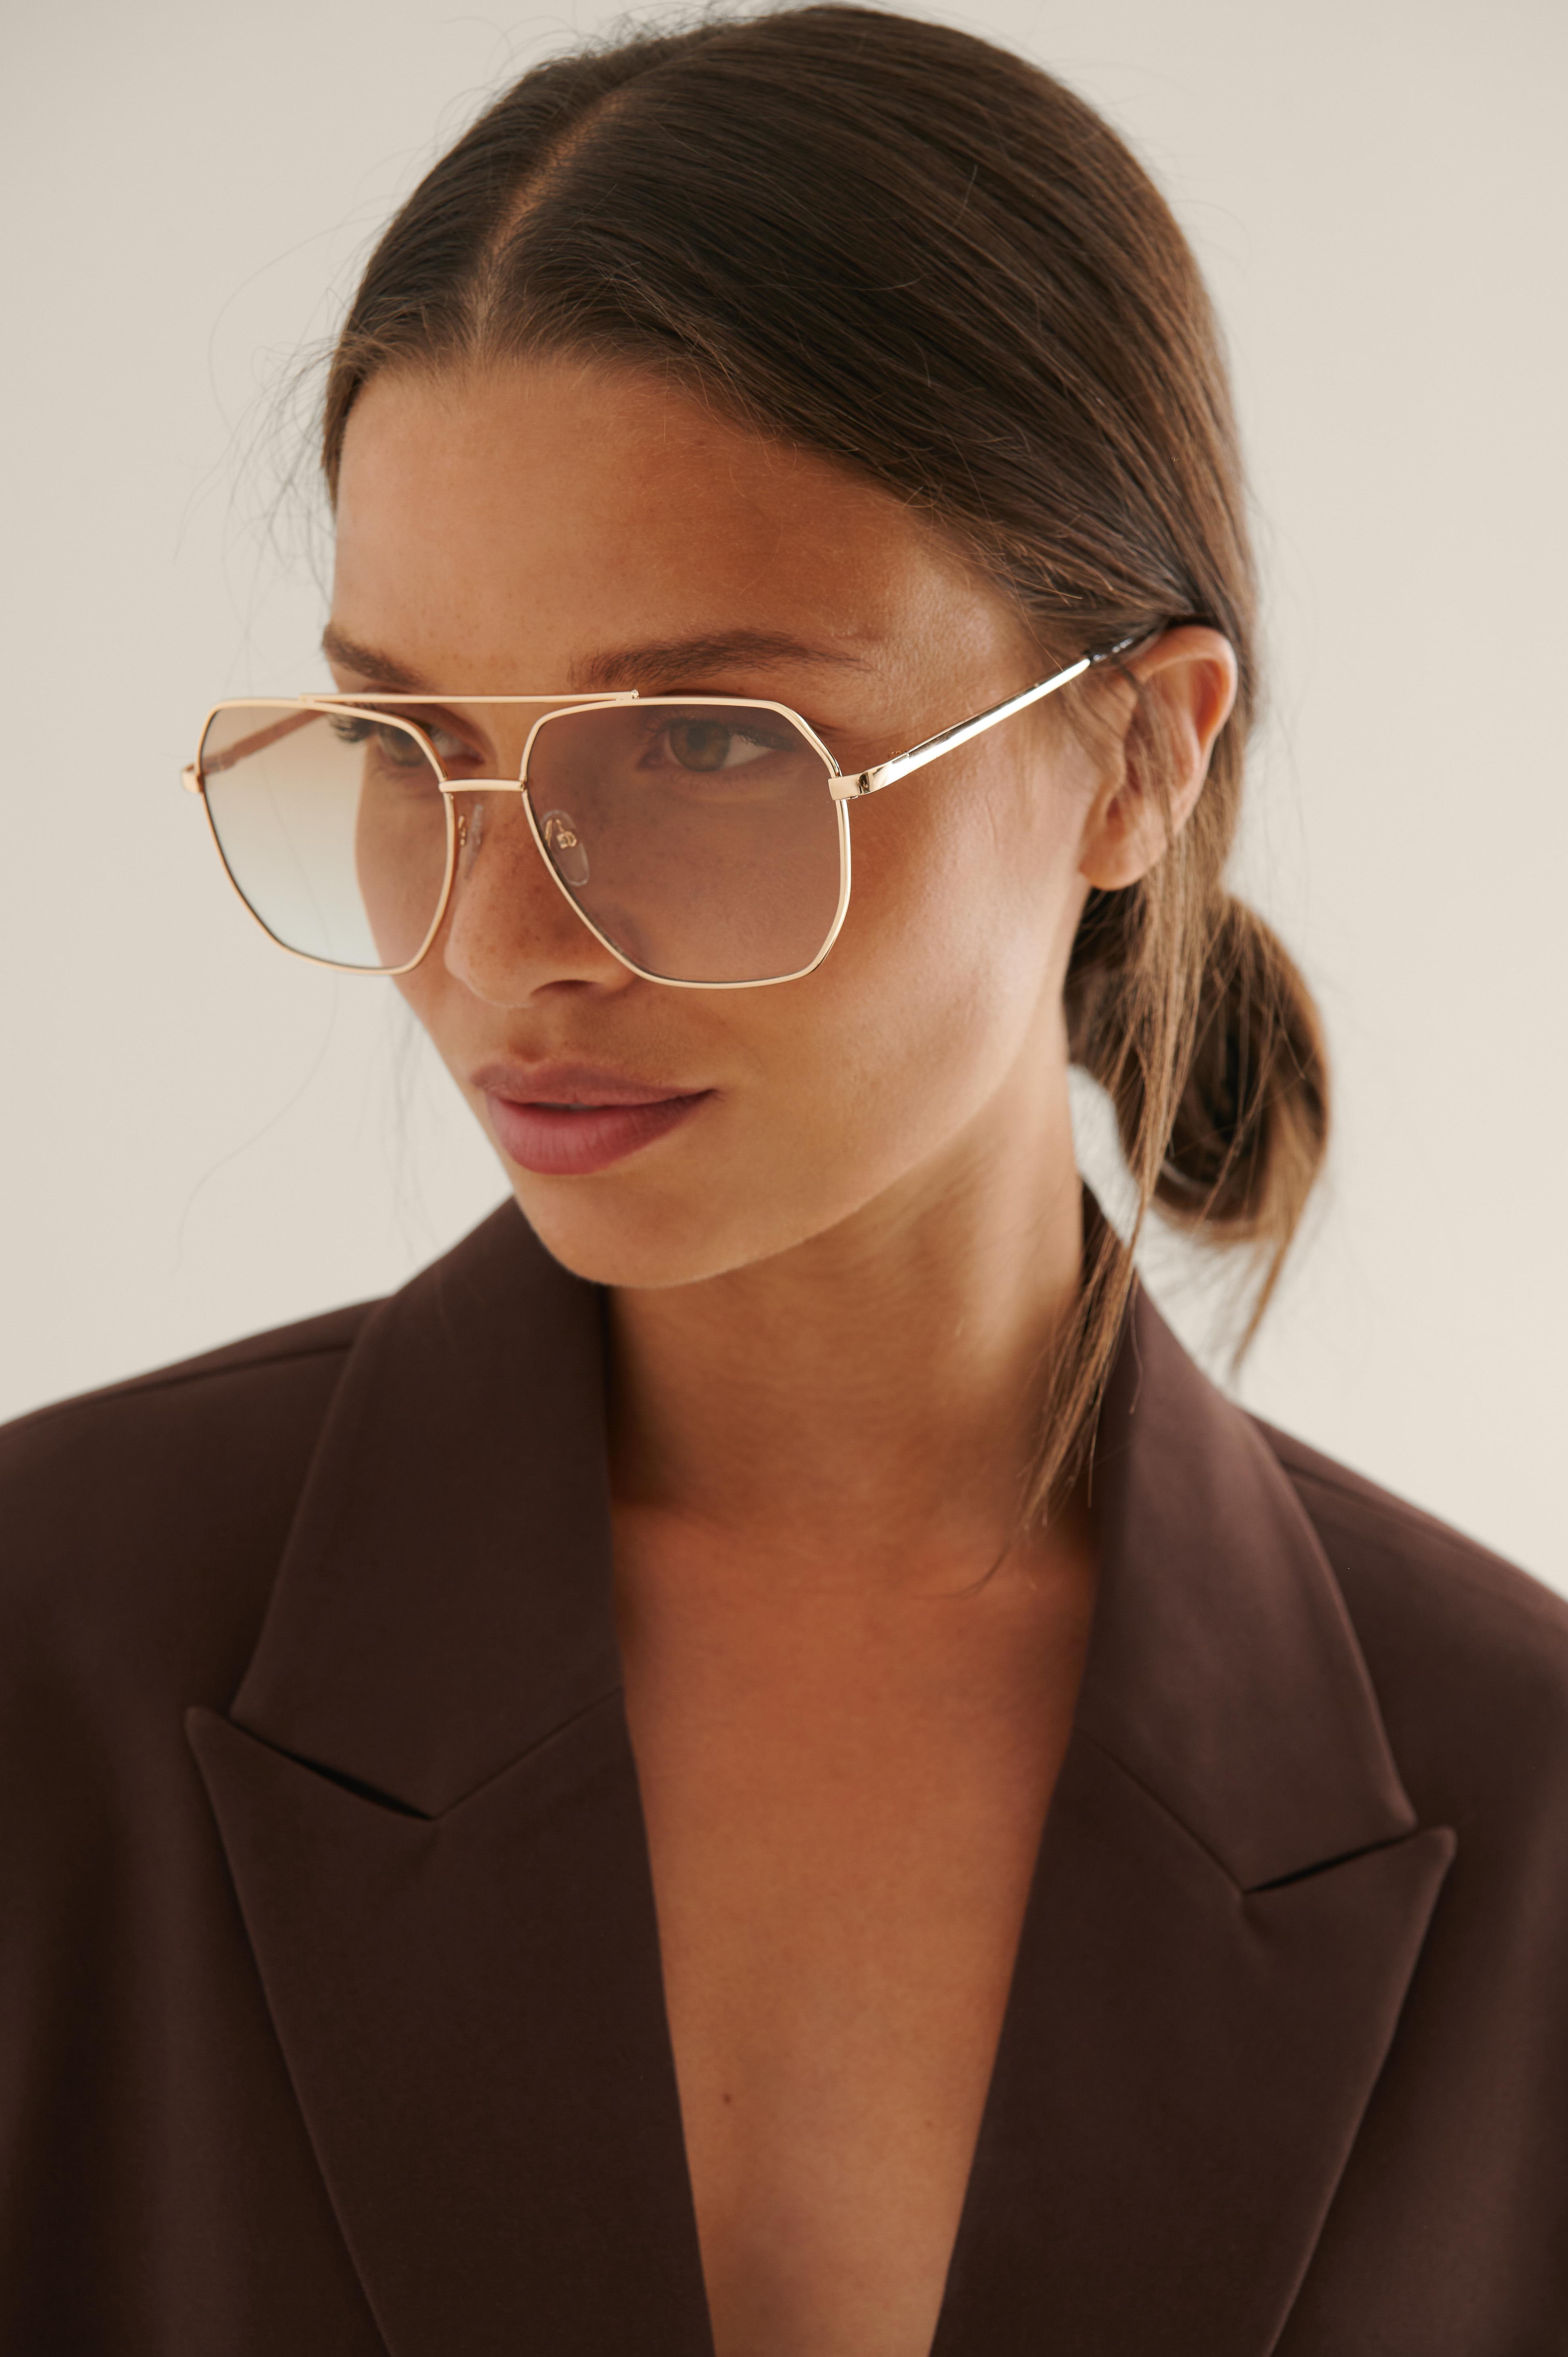 na-kd accessories -  Spitze Metall-Pilot-Sonnenbrille - Brown